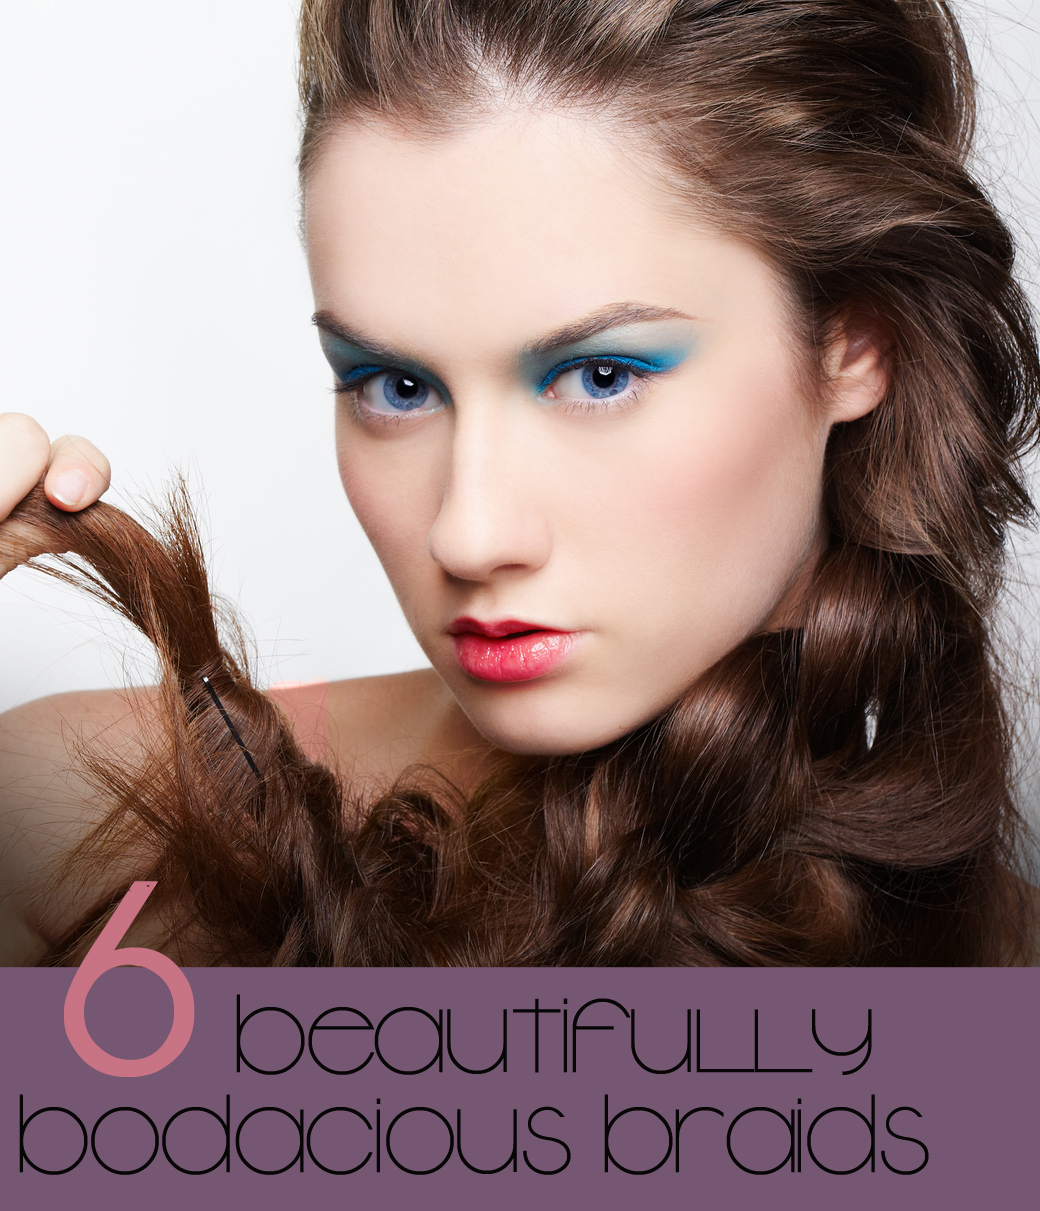 Beautifully-Bodacious-Braids.jpg